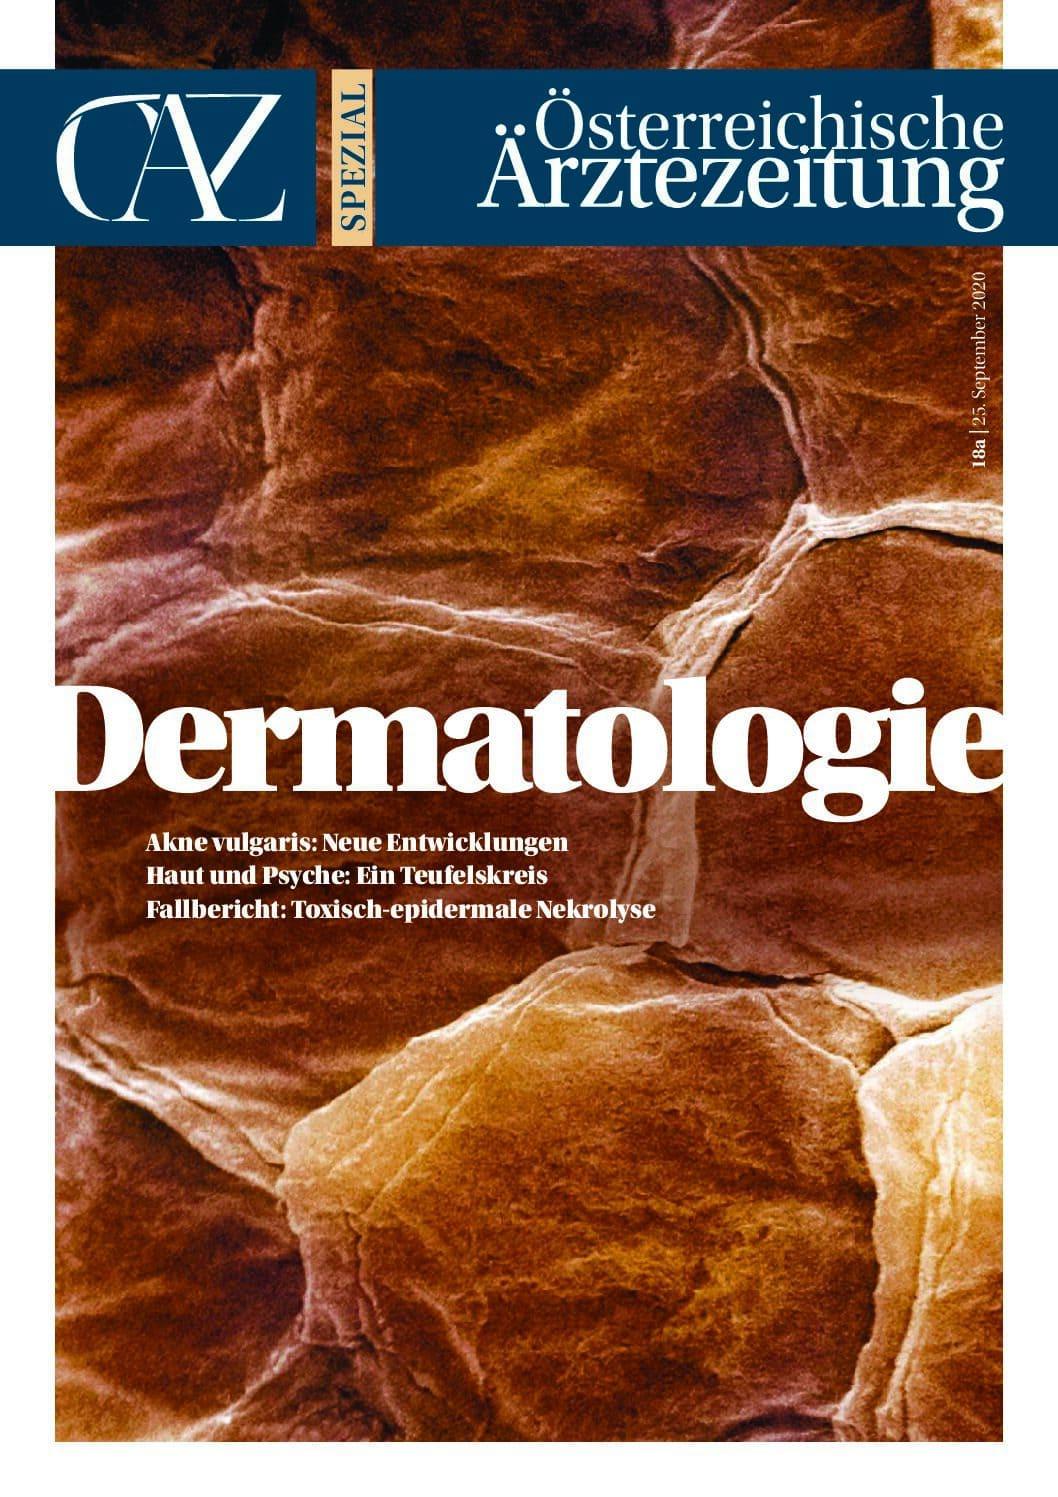 OAZ Spezial Dermatologie 2020